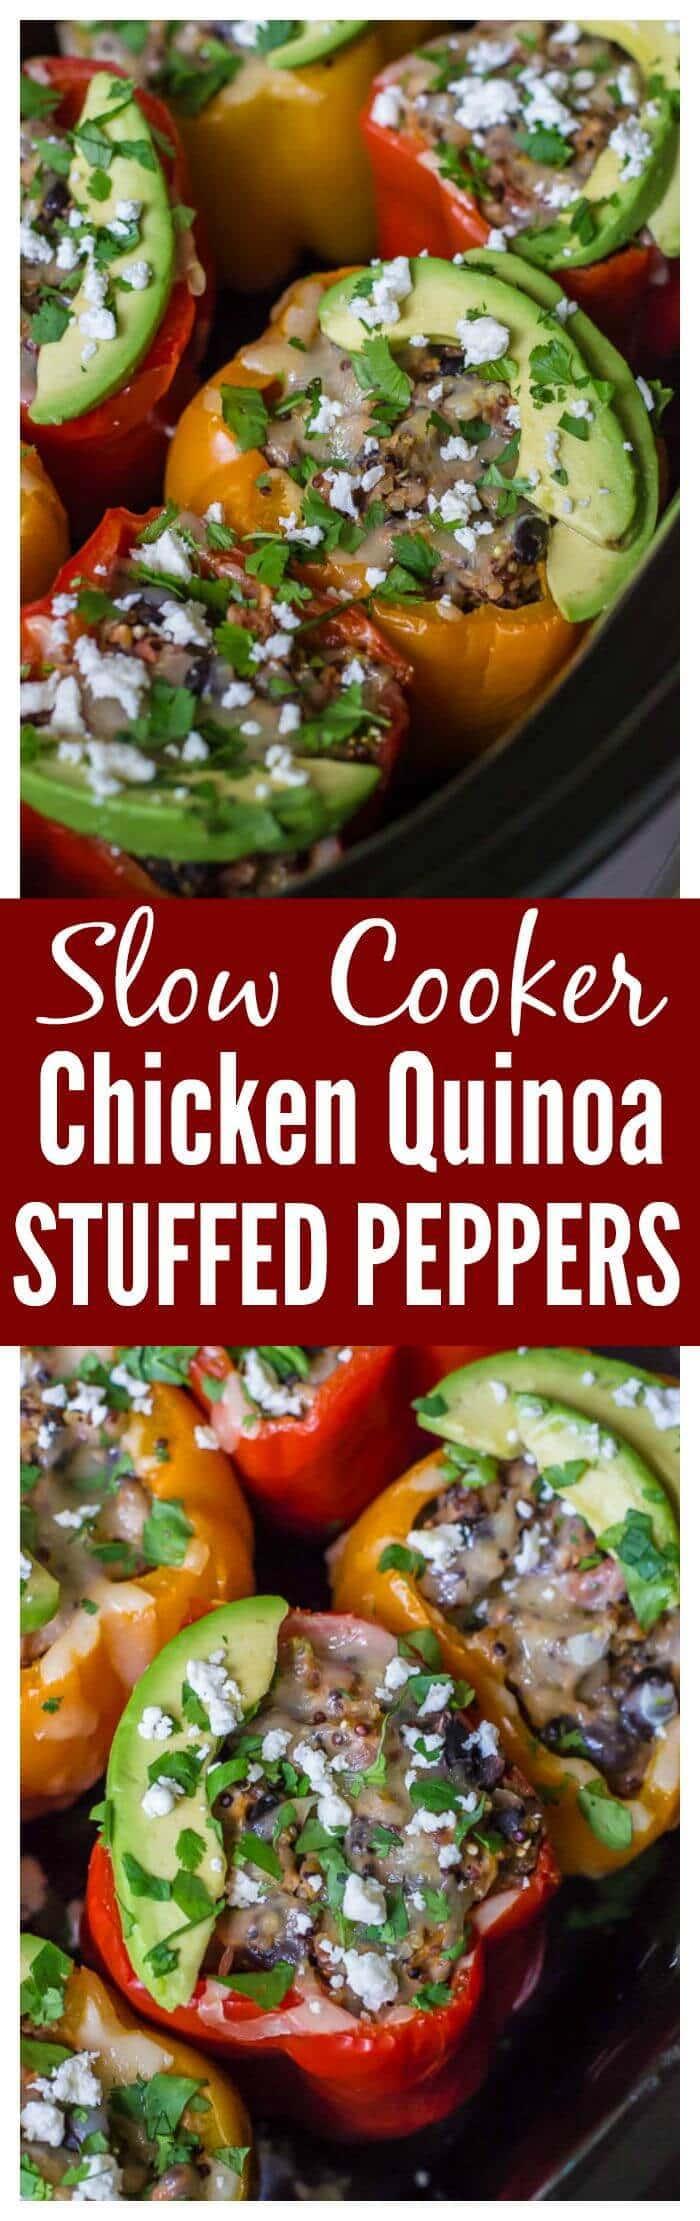 Chicken Quinoa Crock Pot Stuffed Peppers. Healthy, freezer friendly, and no prep work required! #slowcooker #glutenfree #crockpot